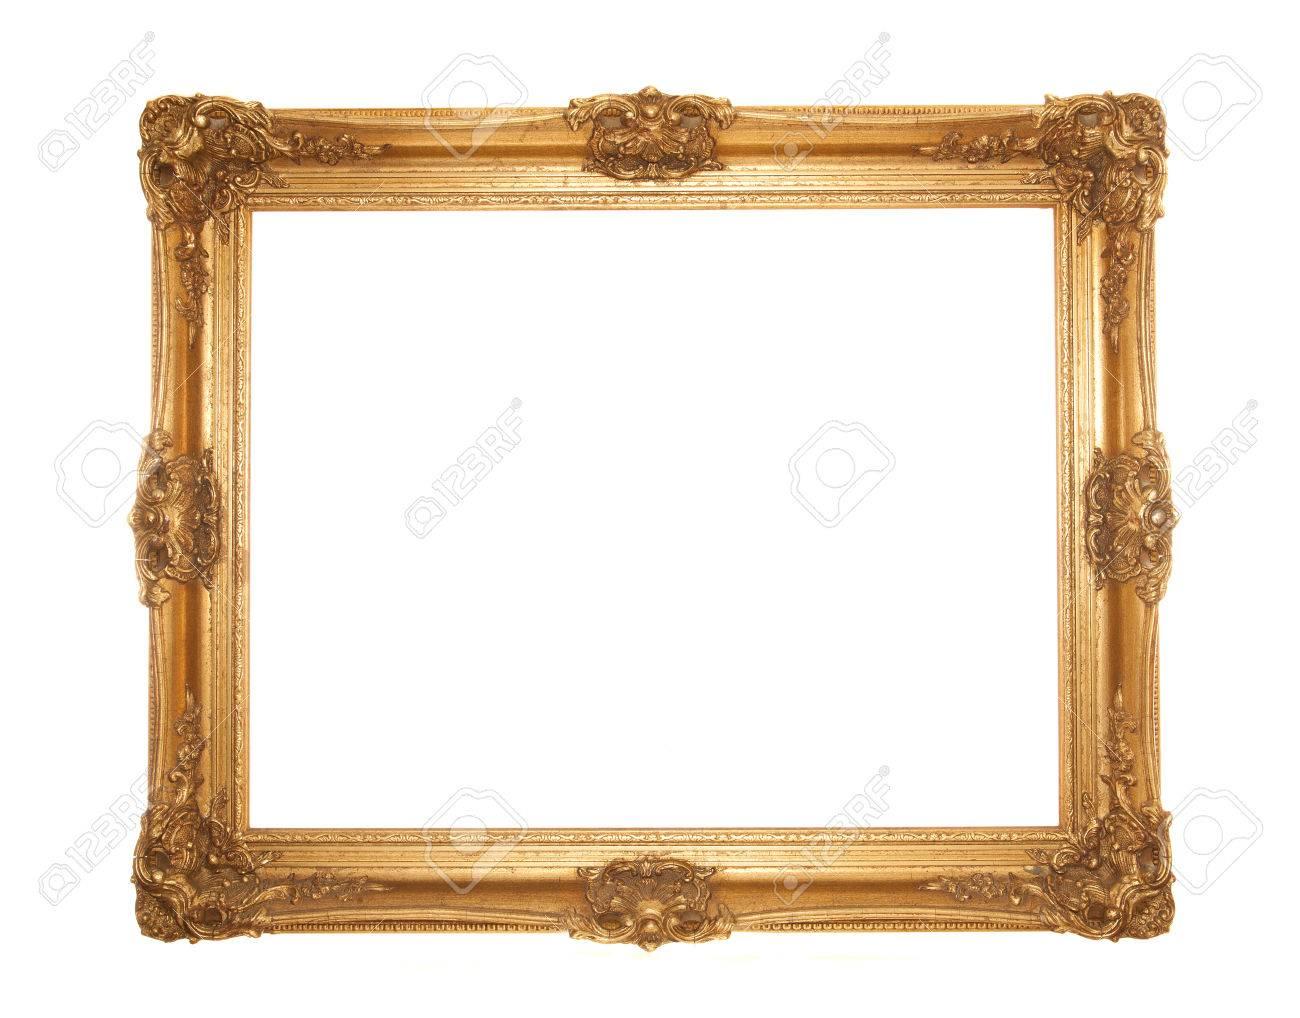 Gran Dorado Oro Marco Rococó Adornado Aislado Fotos, Retratos ...